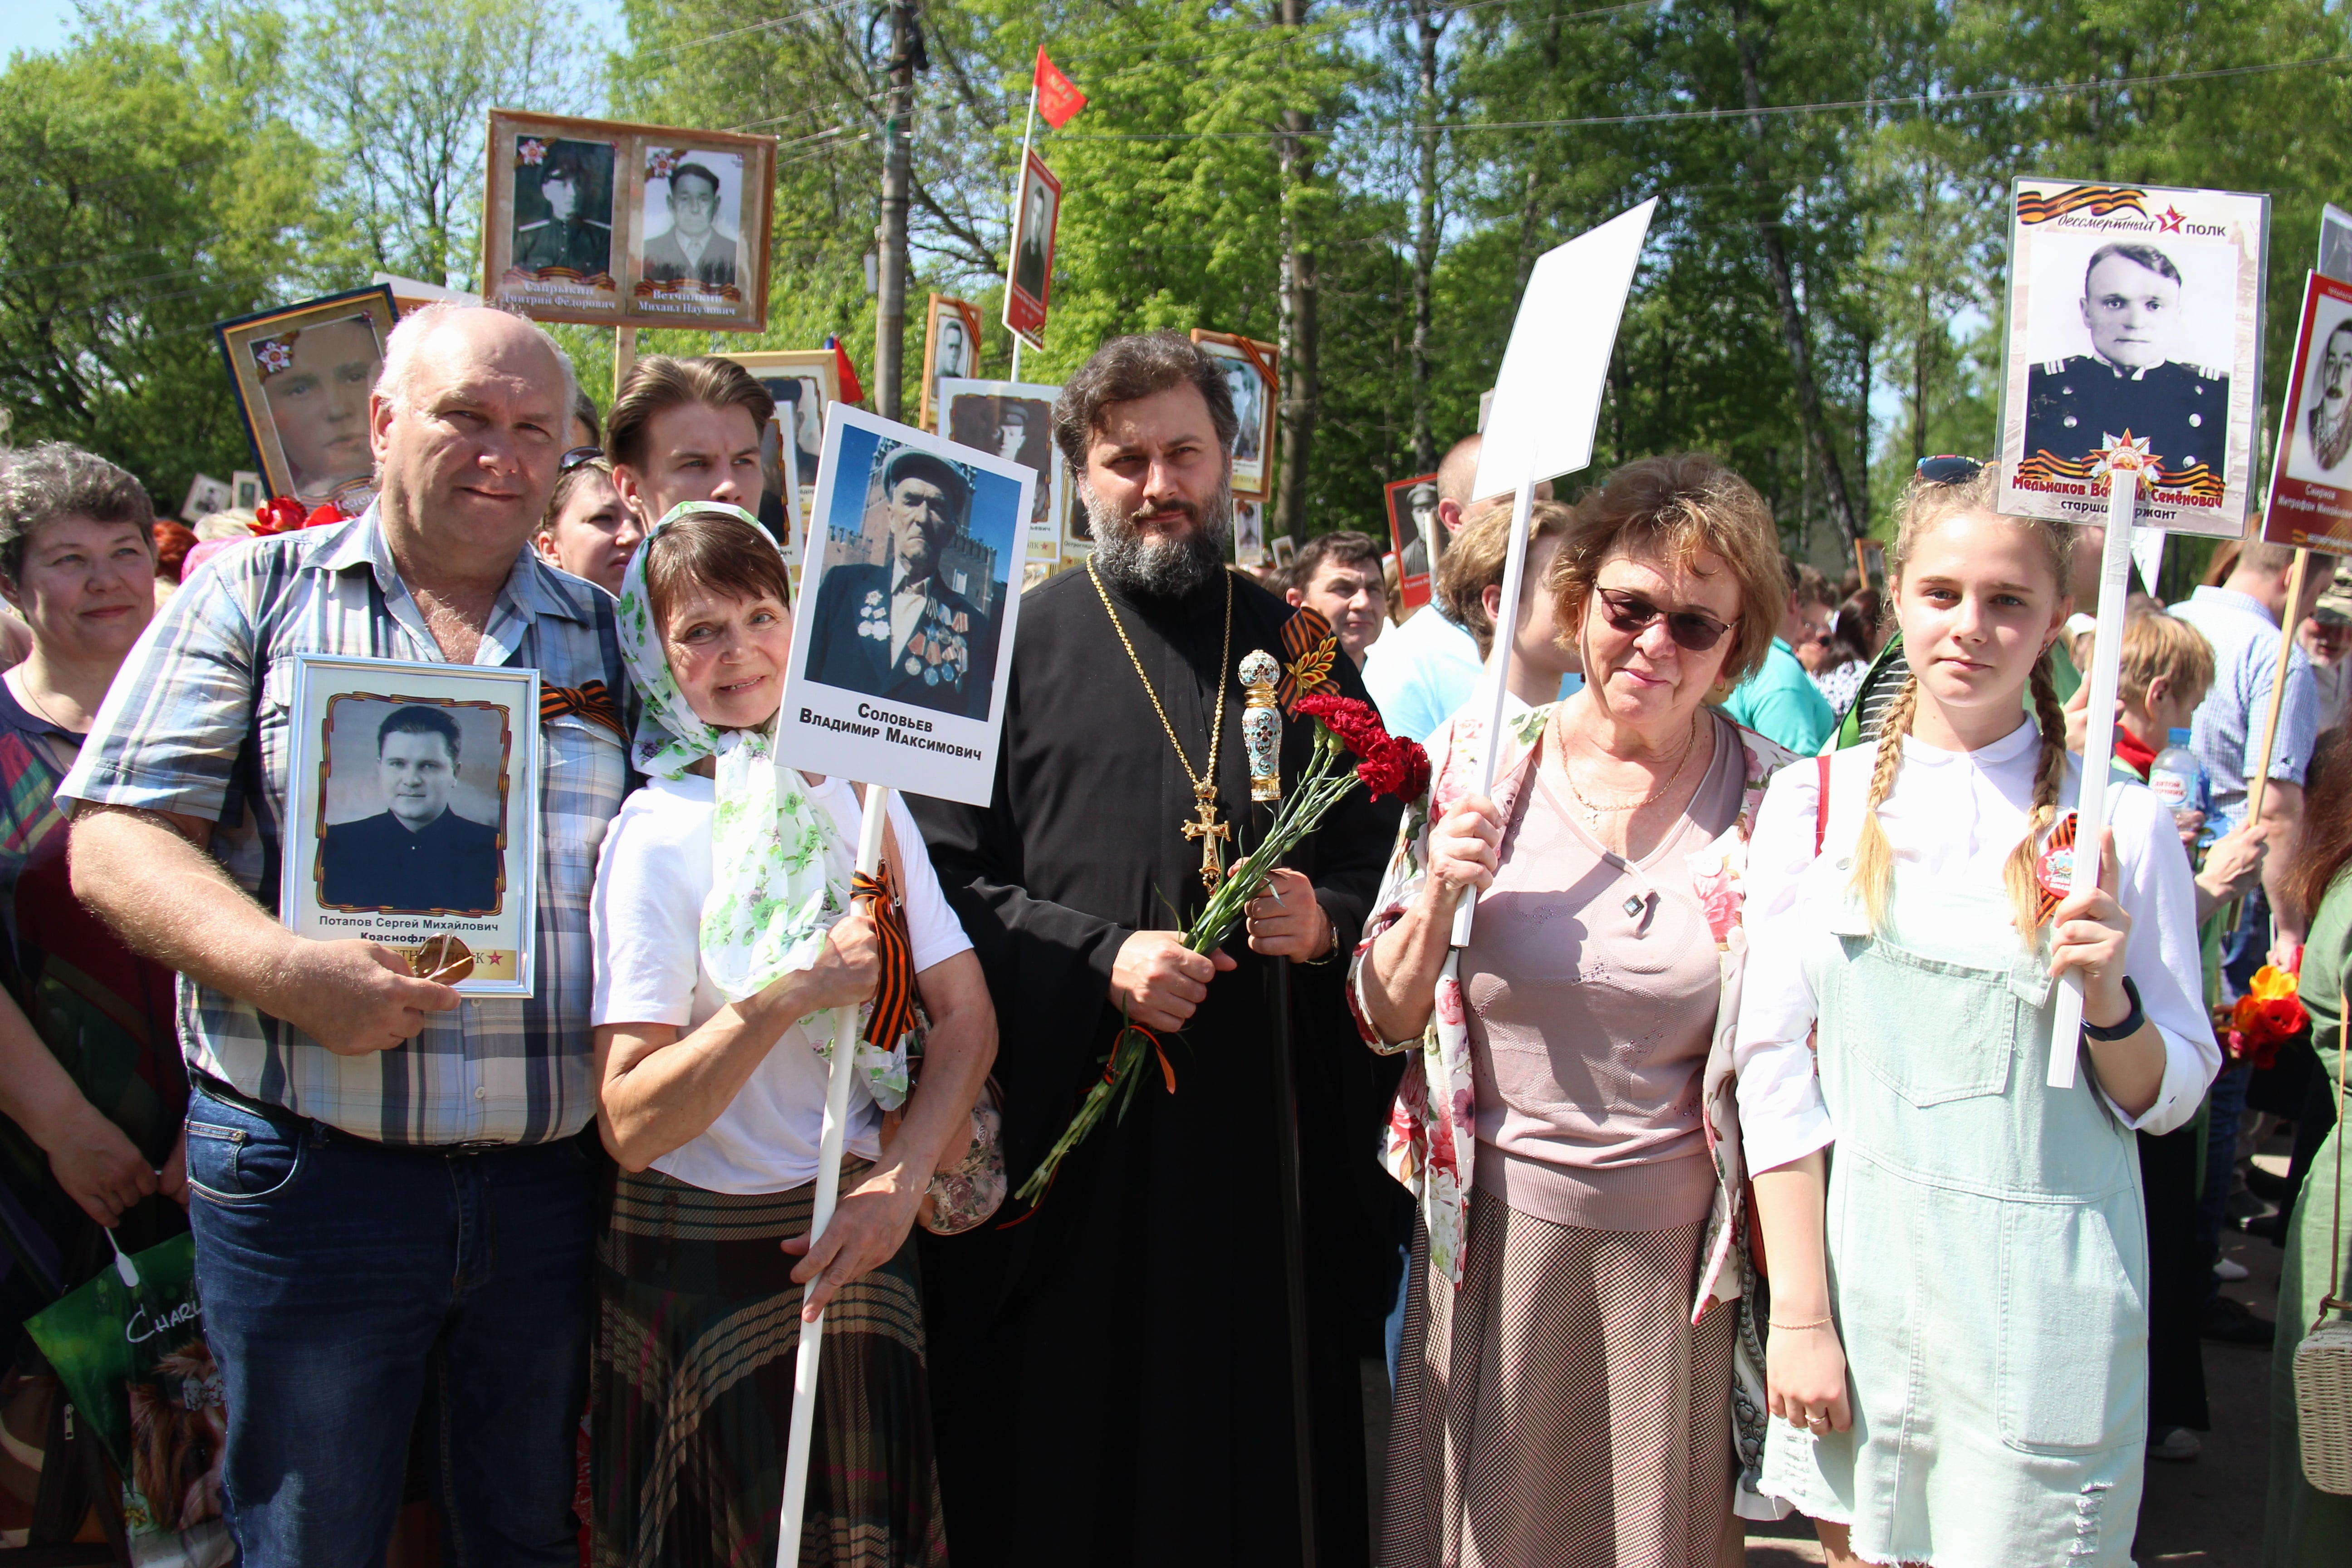 http://monuspen.ru/photoreports/ba2010941251efe9afabca220cb49d98.JPG